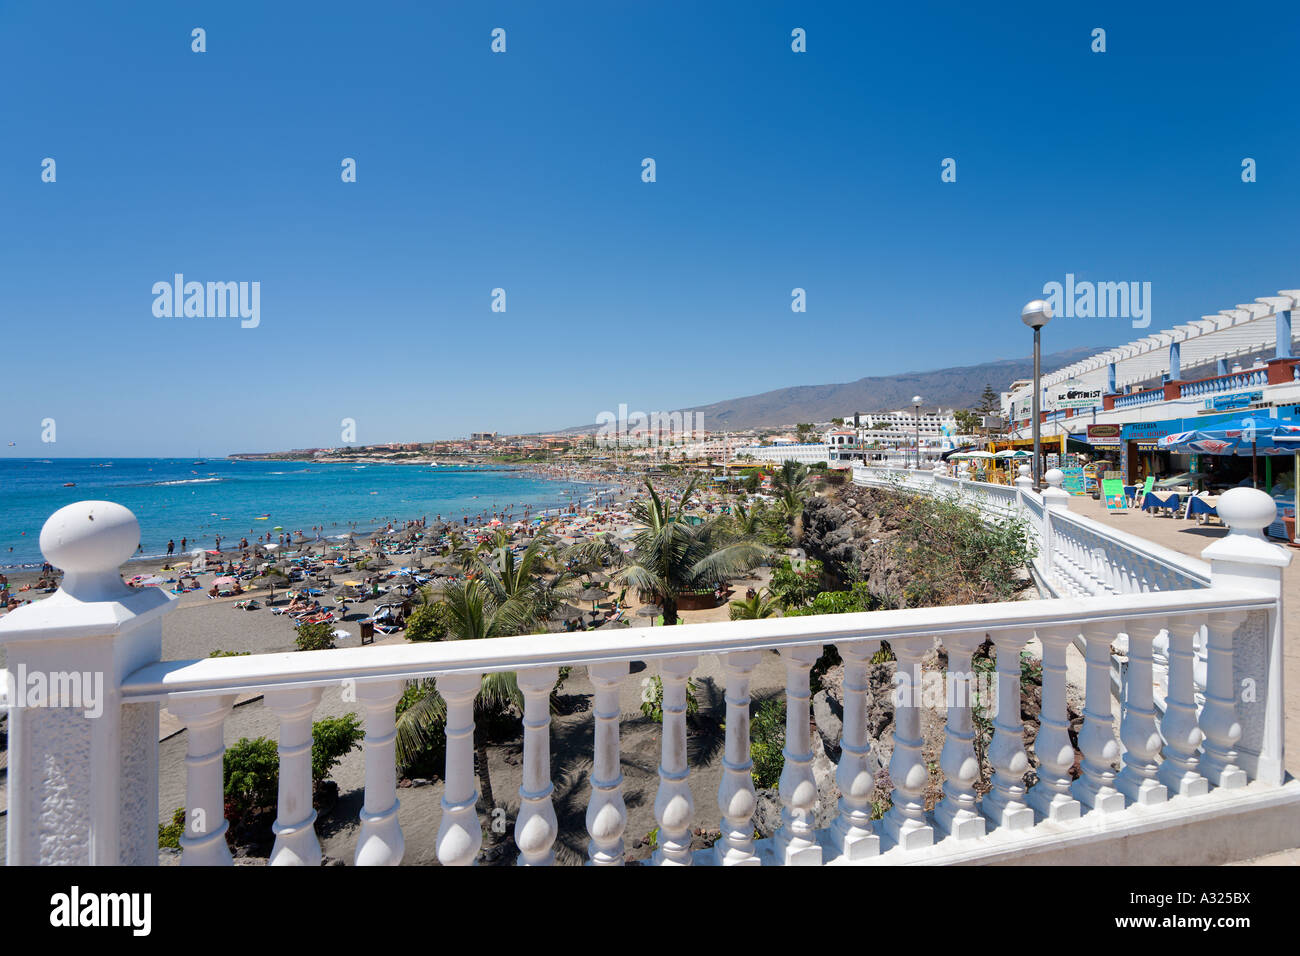 Beach and promenade, Playa Torviscas, Costa Adeje, Playa de las Americas, Tenerife, Canary Islands, Spain - Stock Image